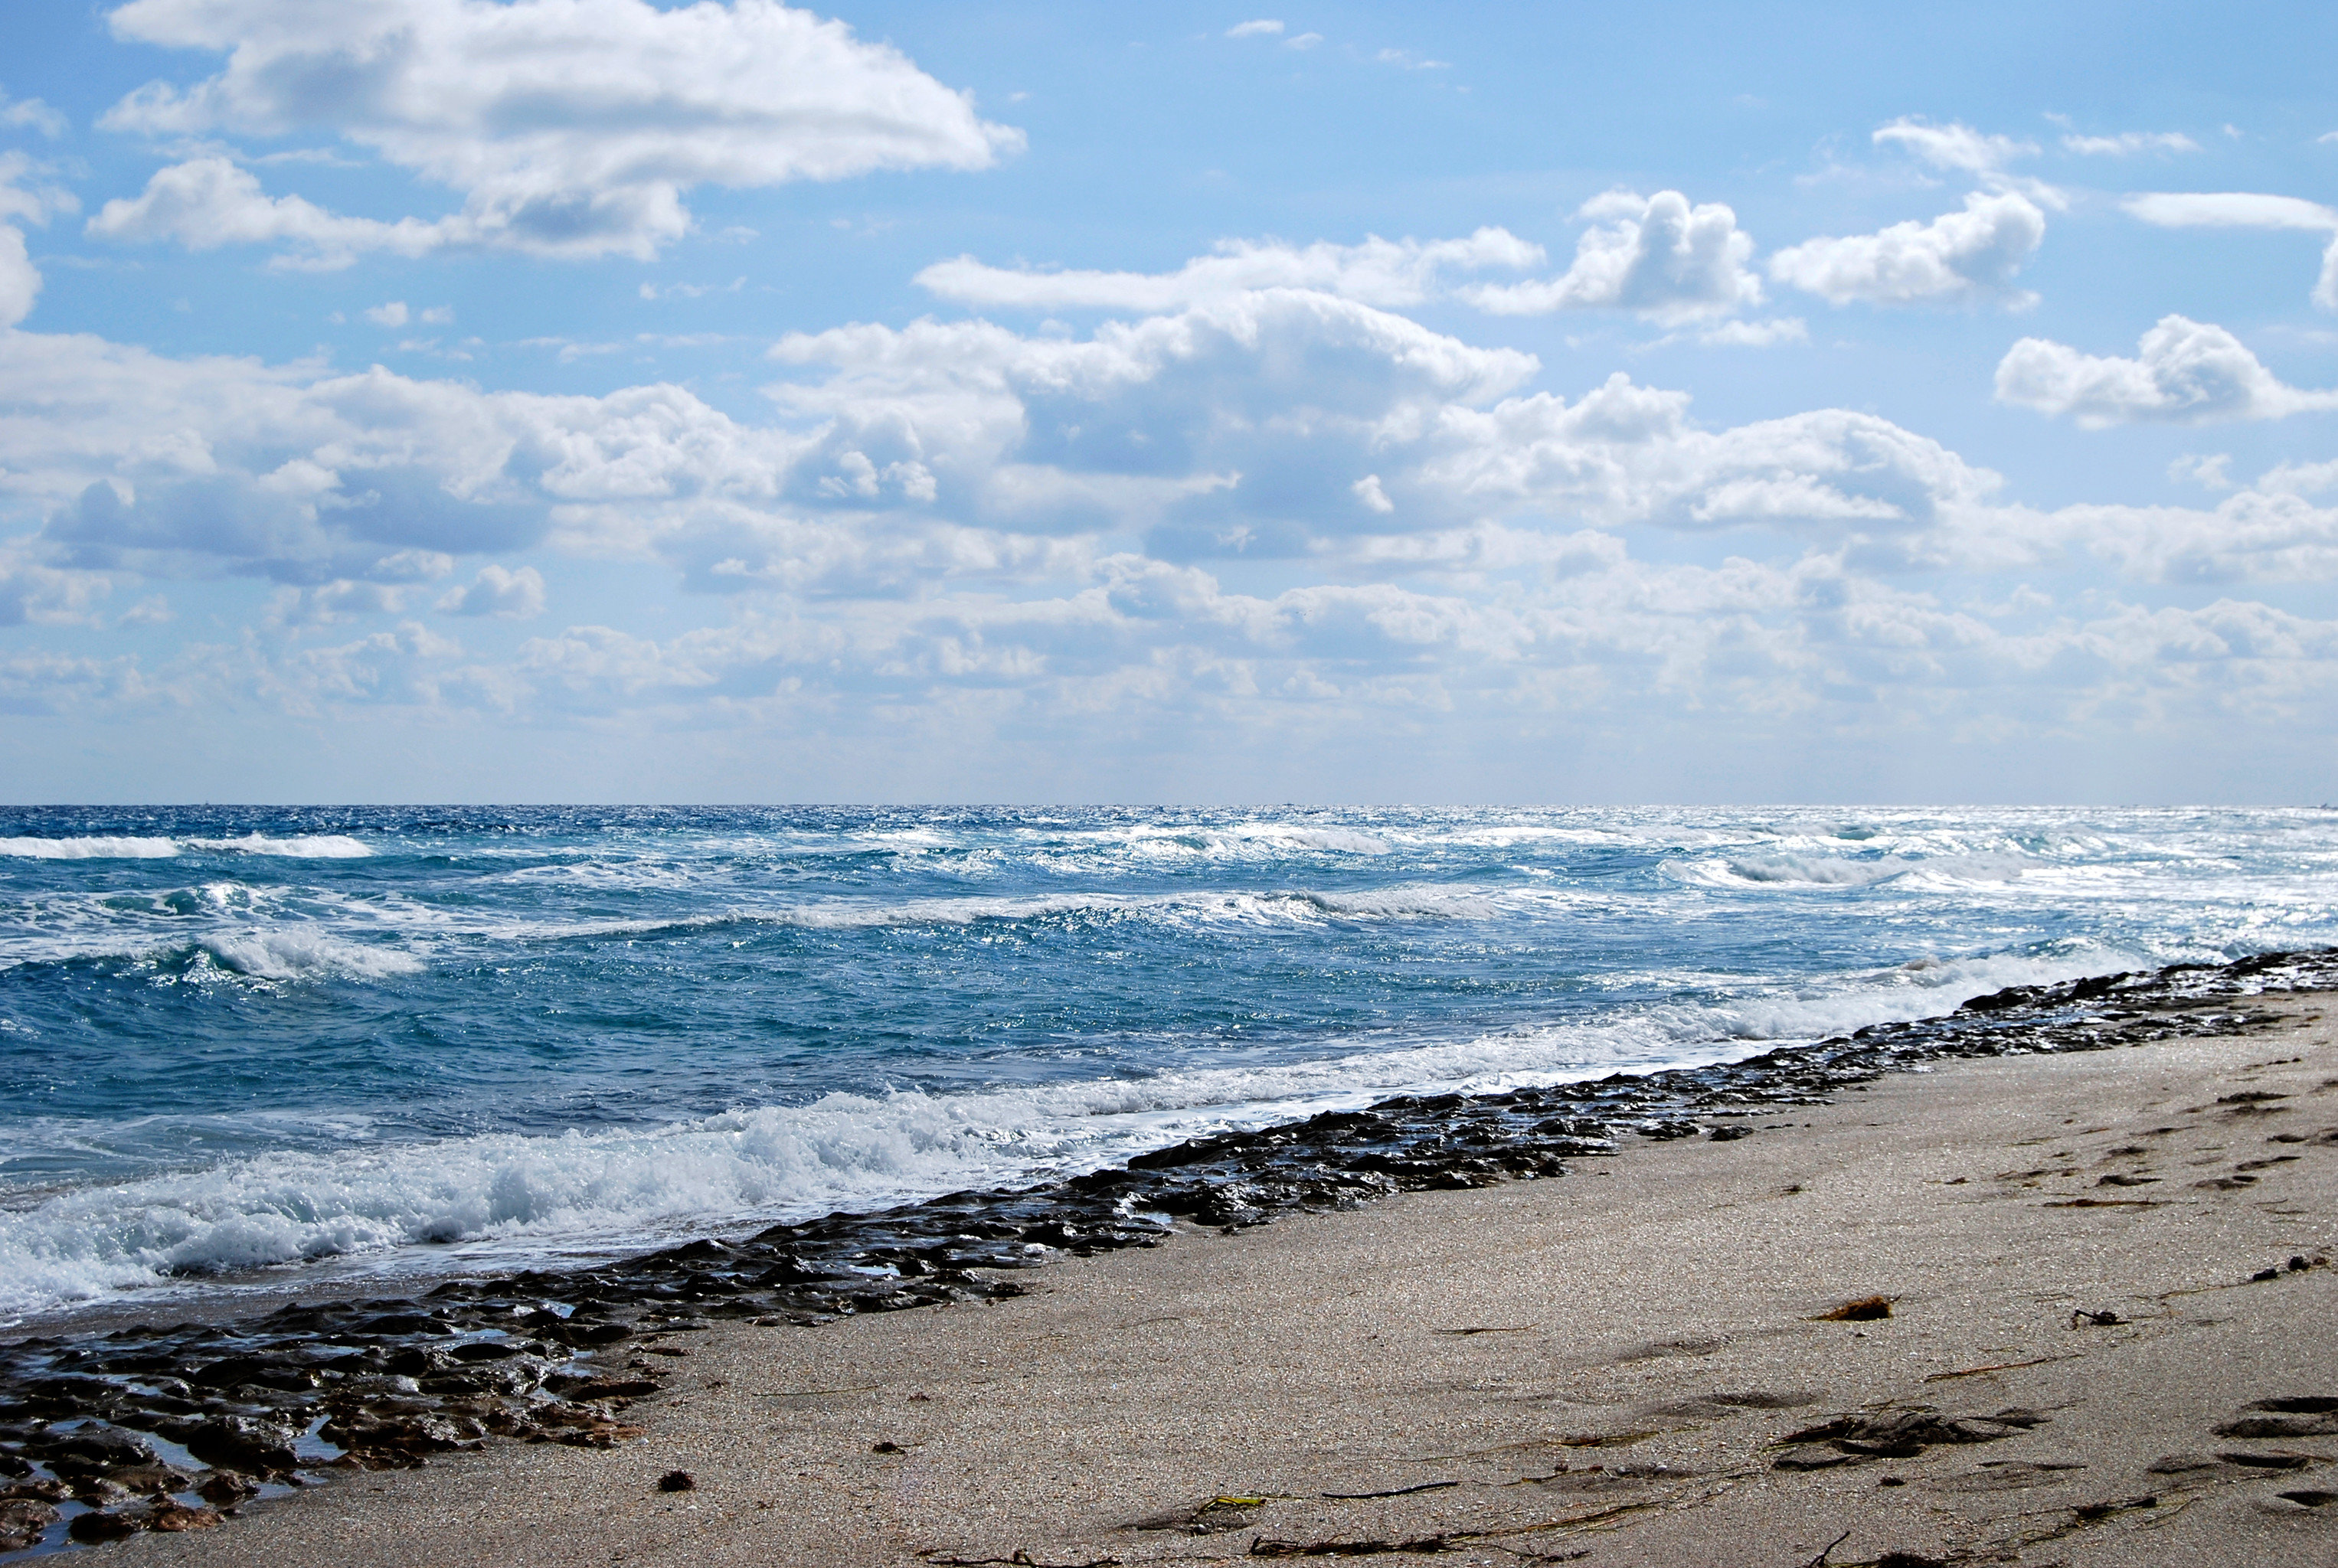 Trip Ideas outdoor sky shore Sea Beach Ocean body of water Coast wind wave horizon wave Nature cloud sand rock cape material sandy